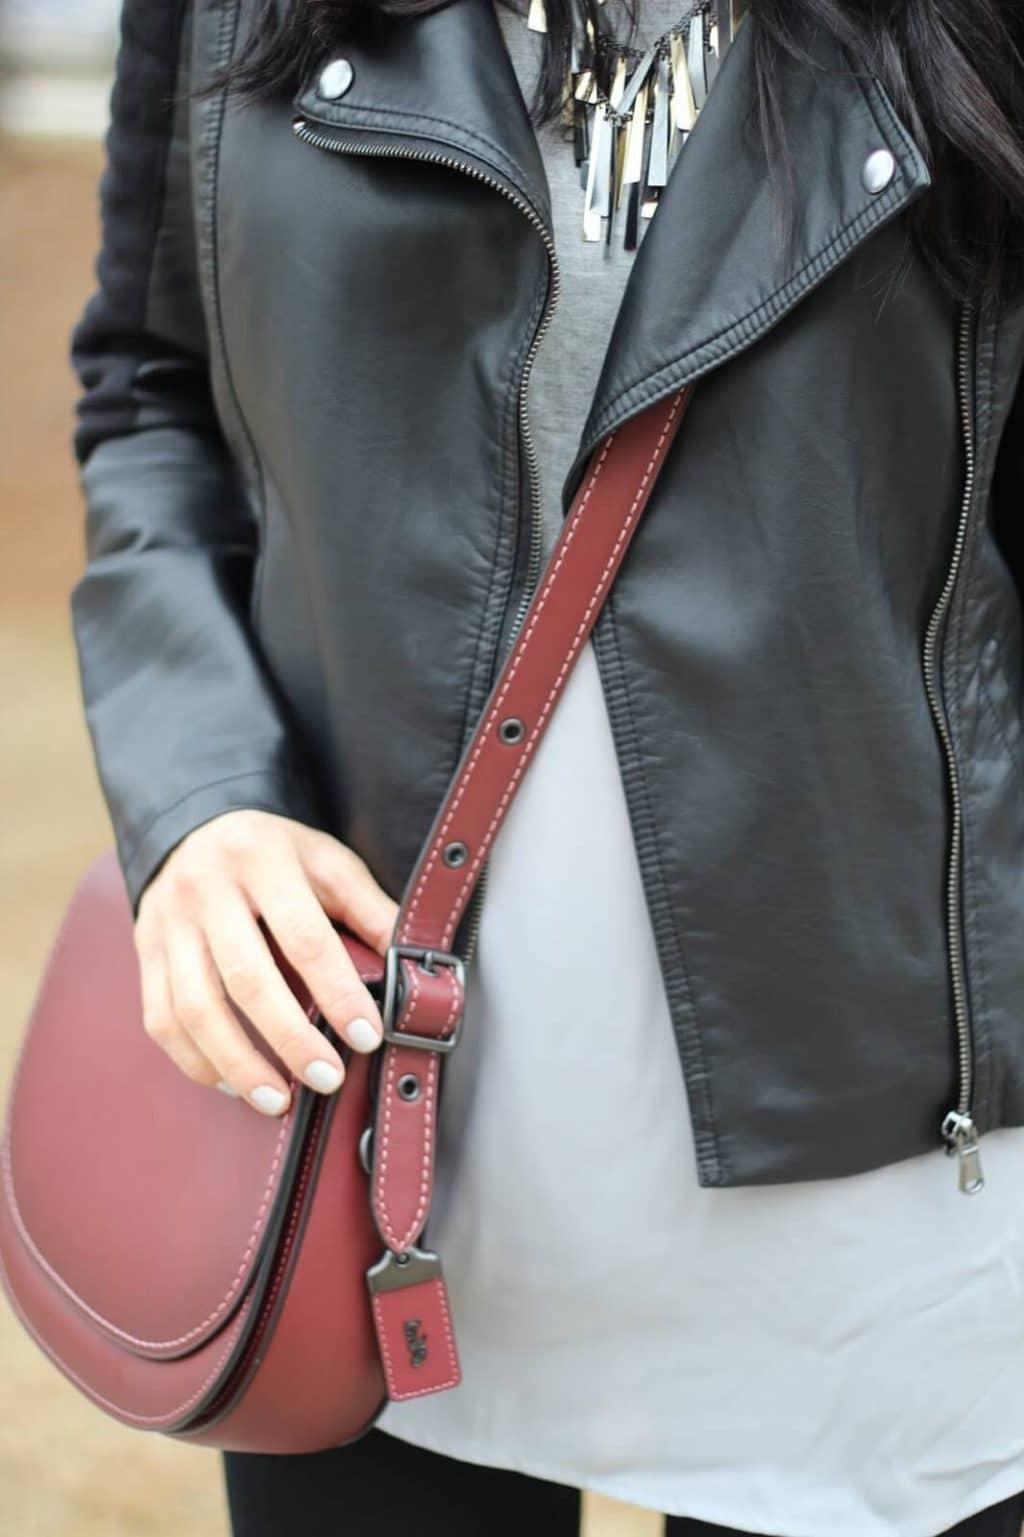 Leather Jacket, Distressed Denim, Coach Saddle Bag